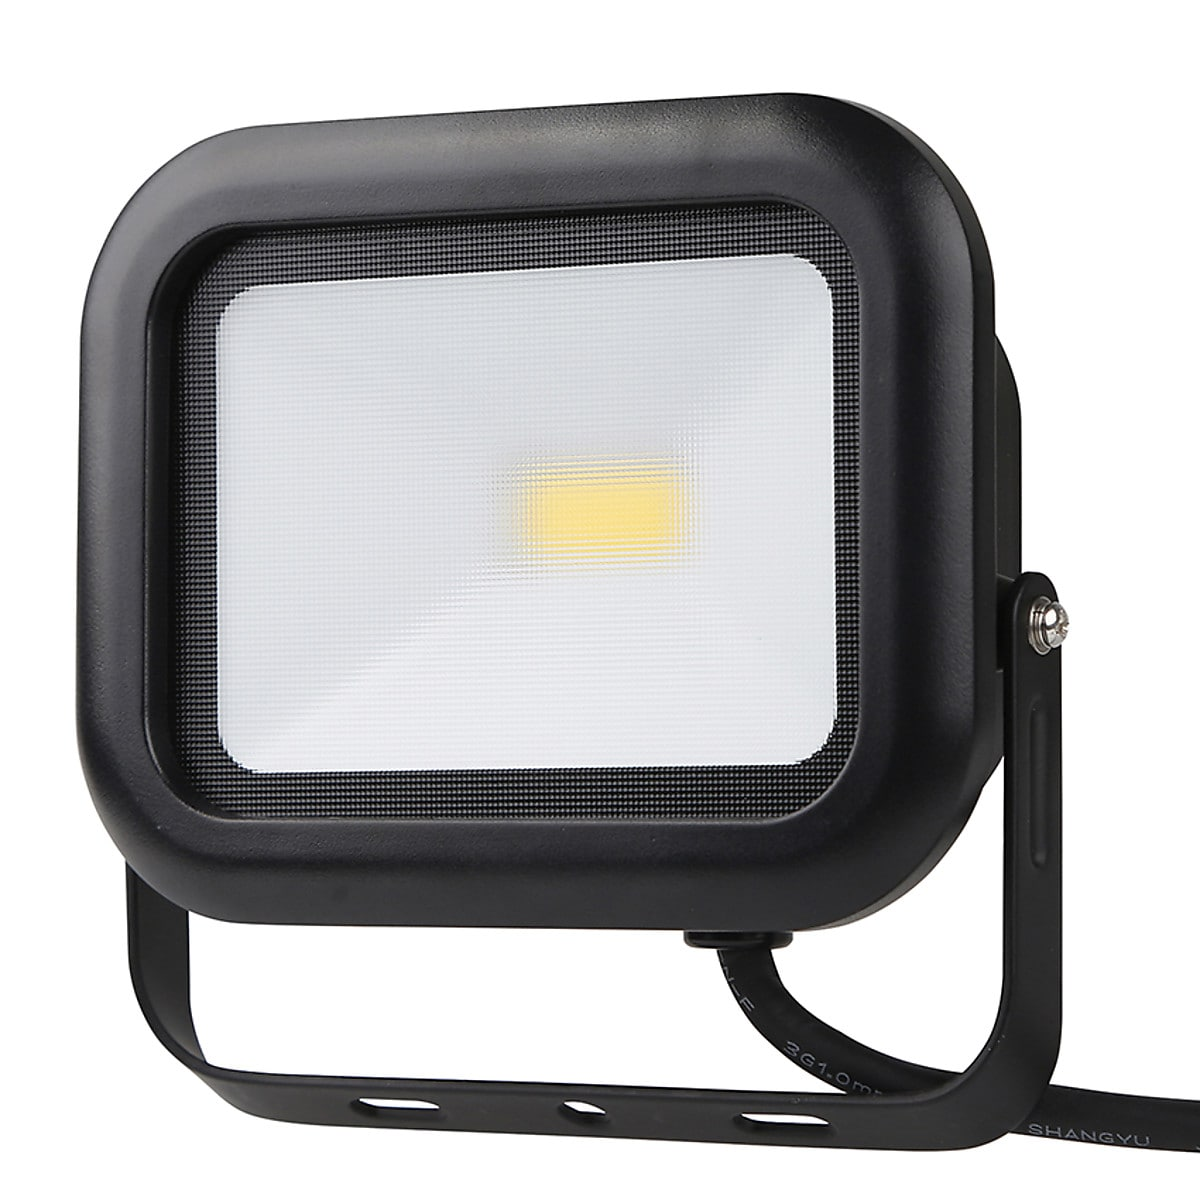 Cotech LED-lyskaster 15 W